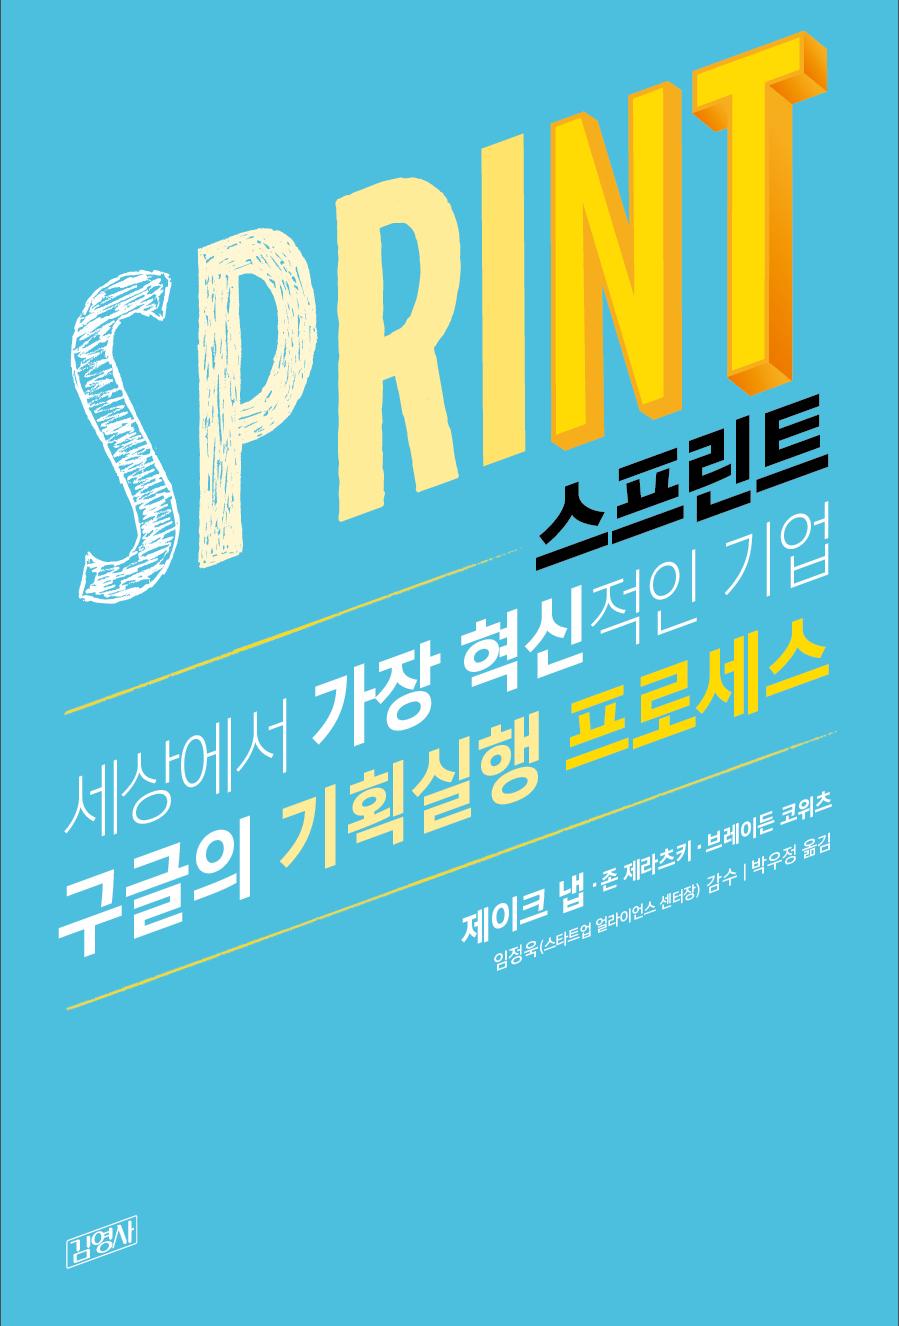 Sprint_Cover_Korea.jpg